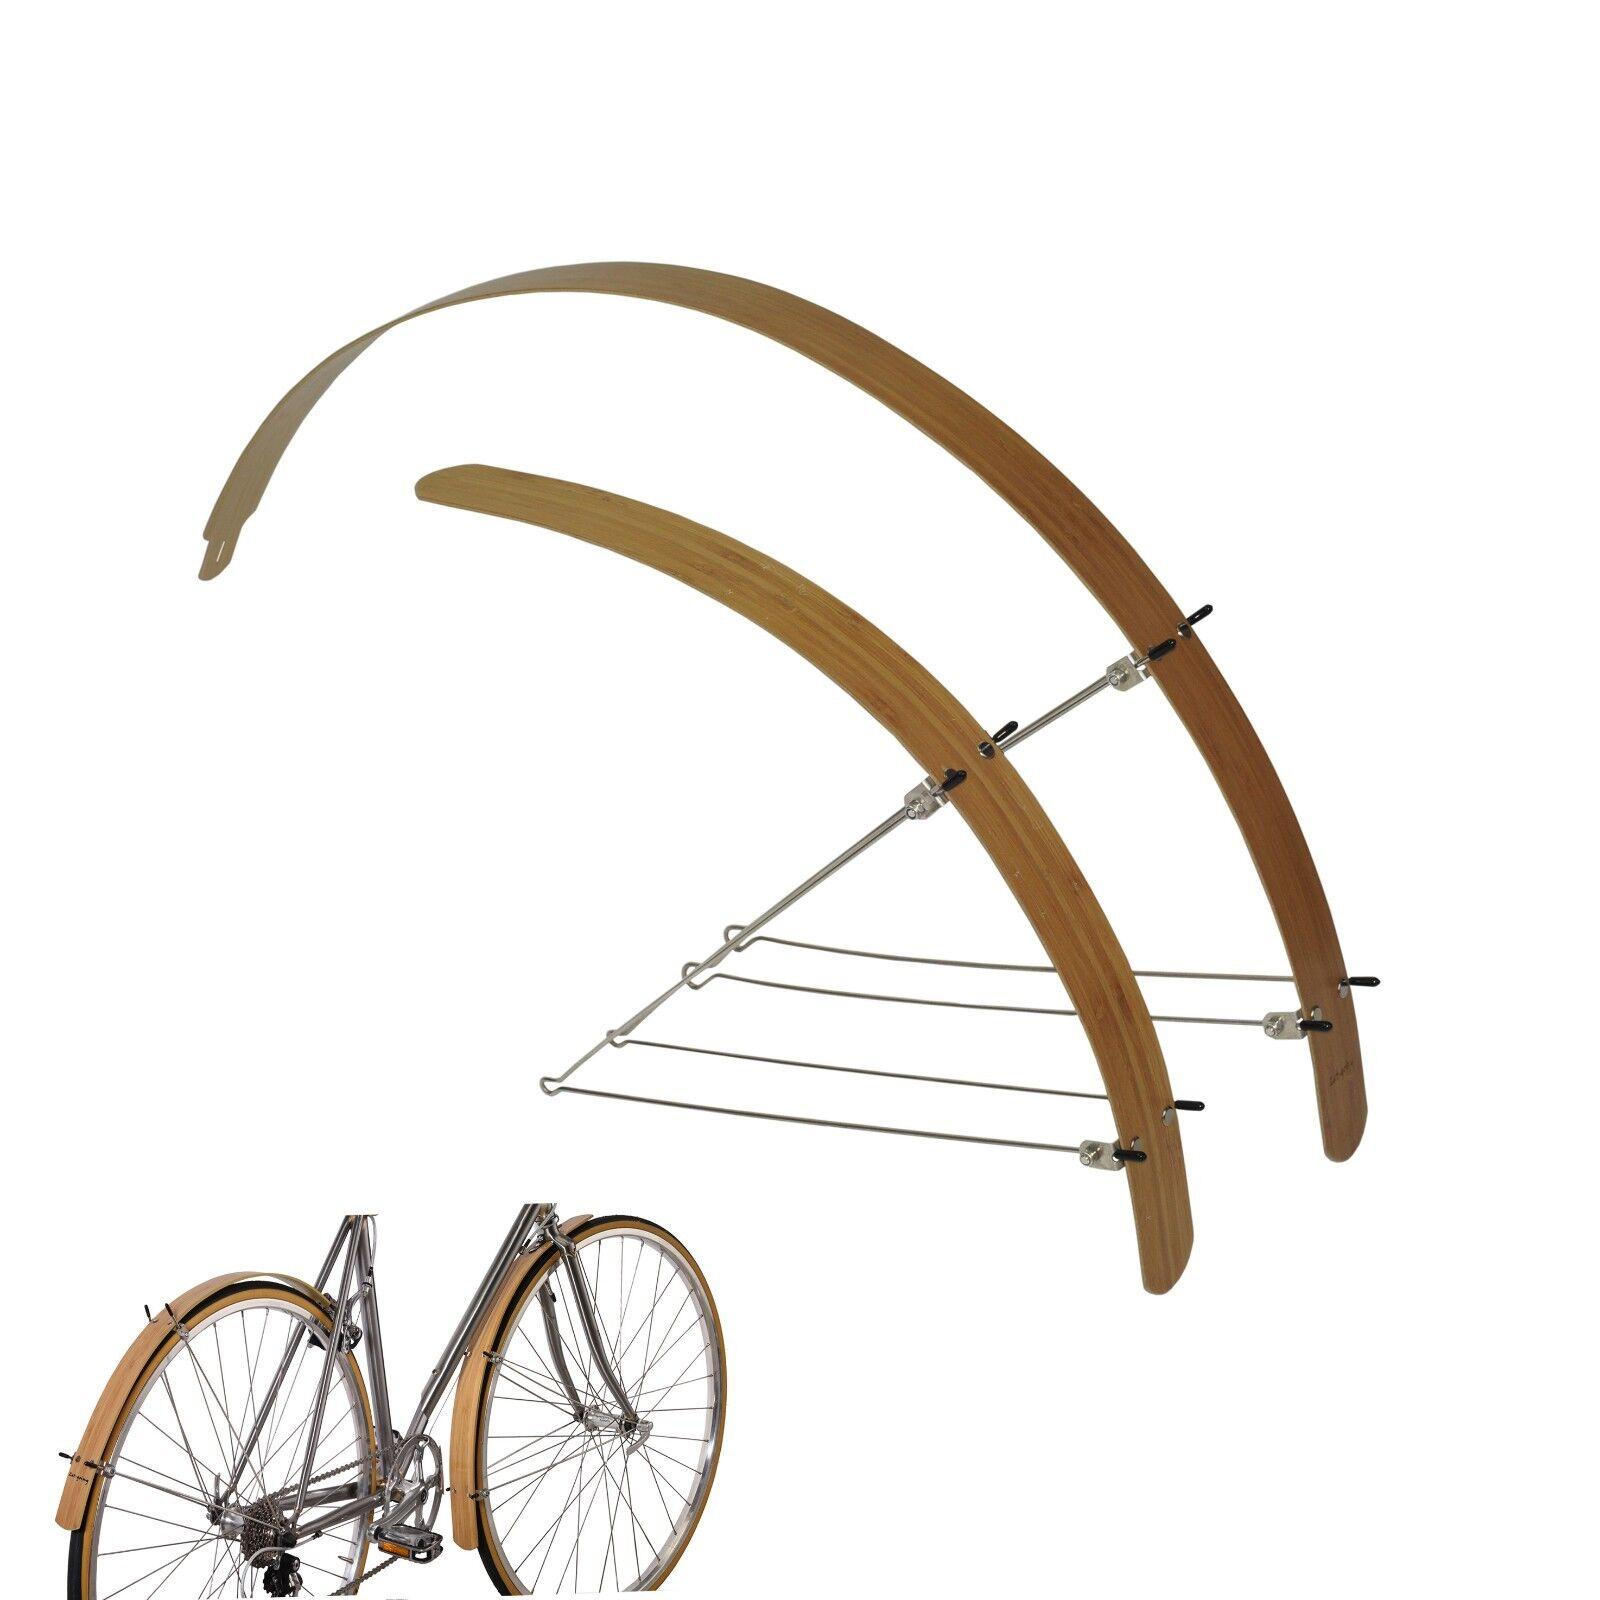 Bike Fender Bamboo  Wood Flat For  20   24  26   Road City 700C Width 45mm  best price